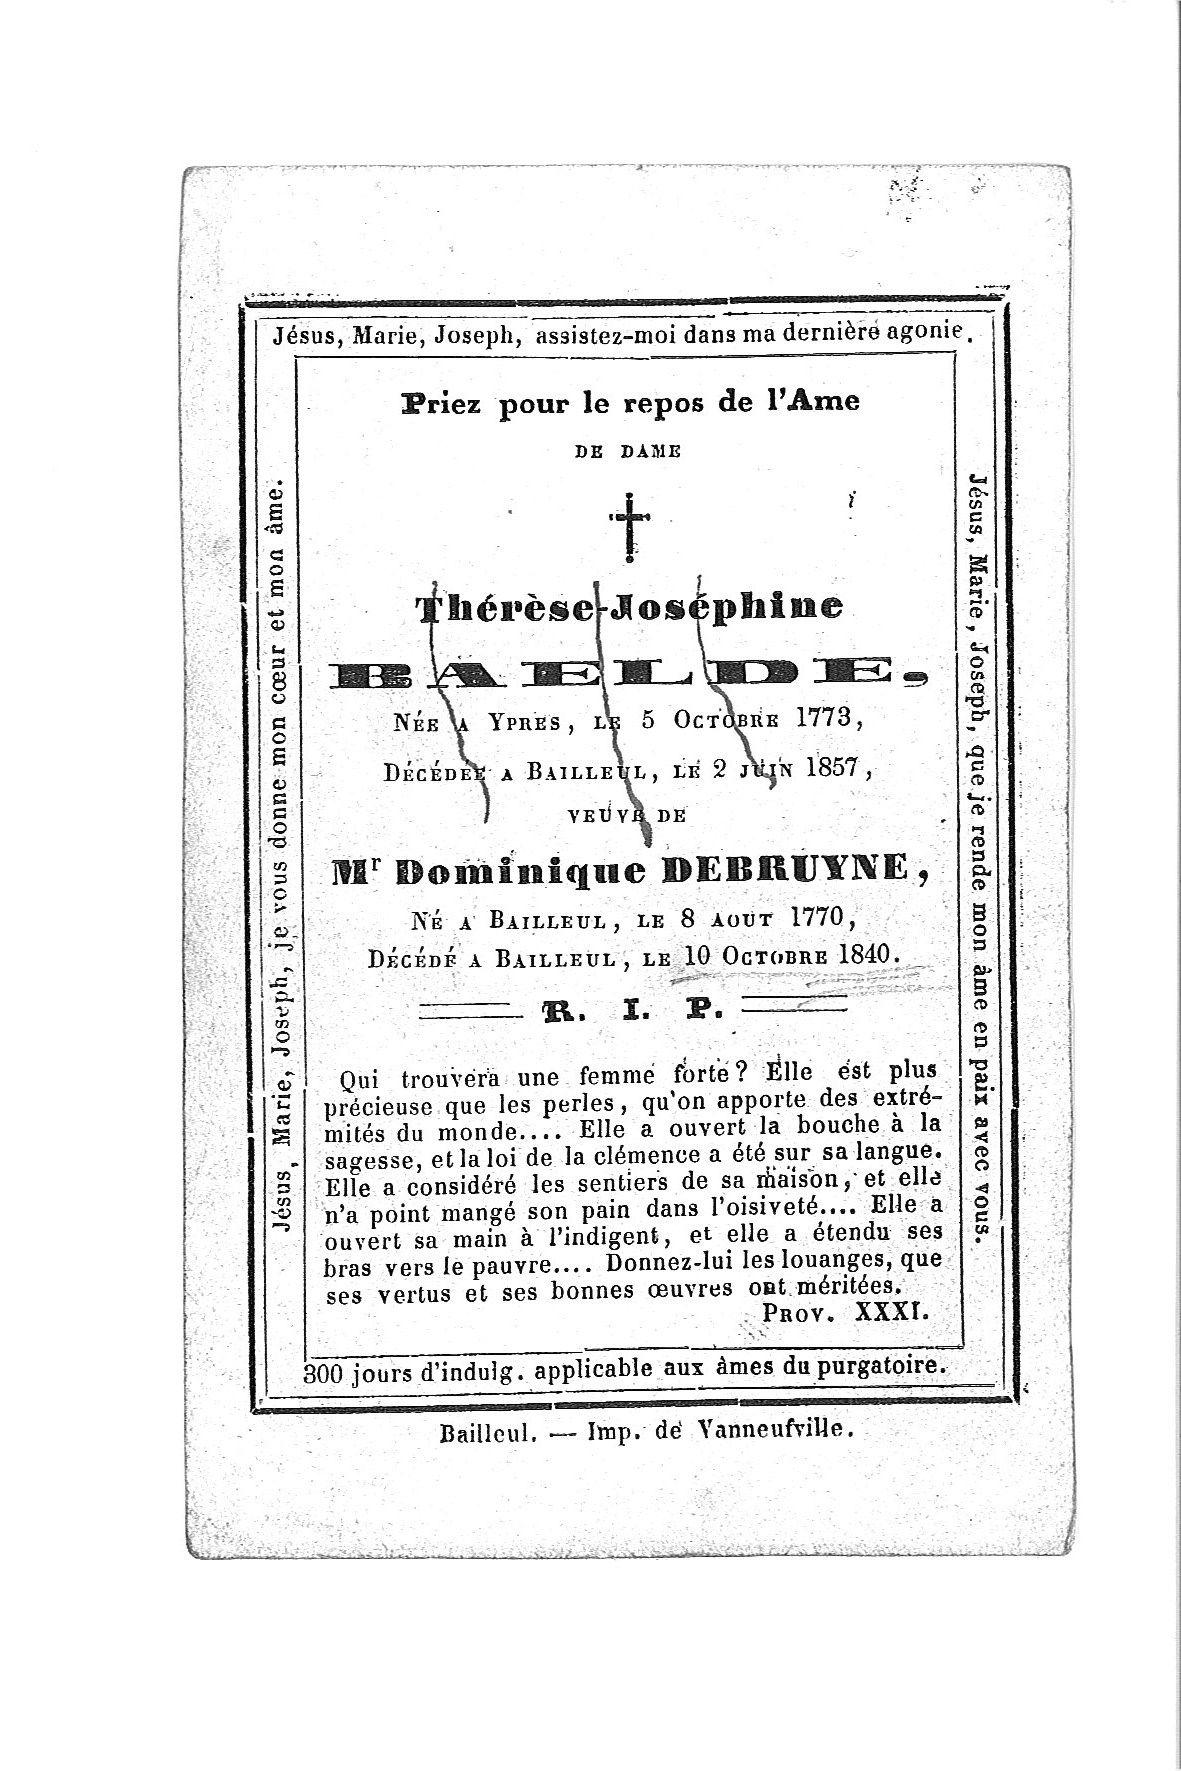 thérèse-joséphine(1857)20090507120032_00001.jpg